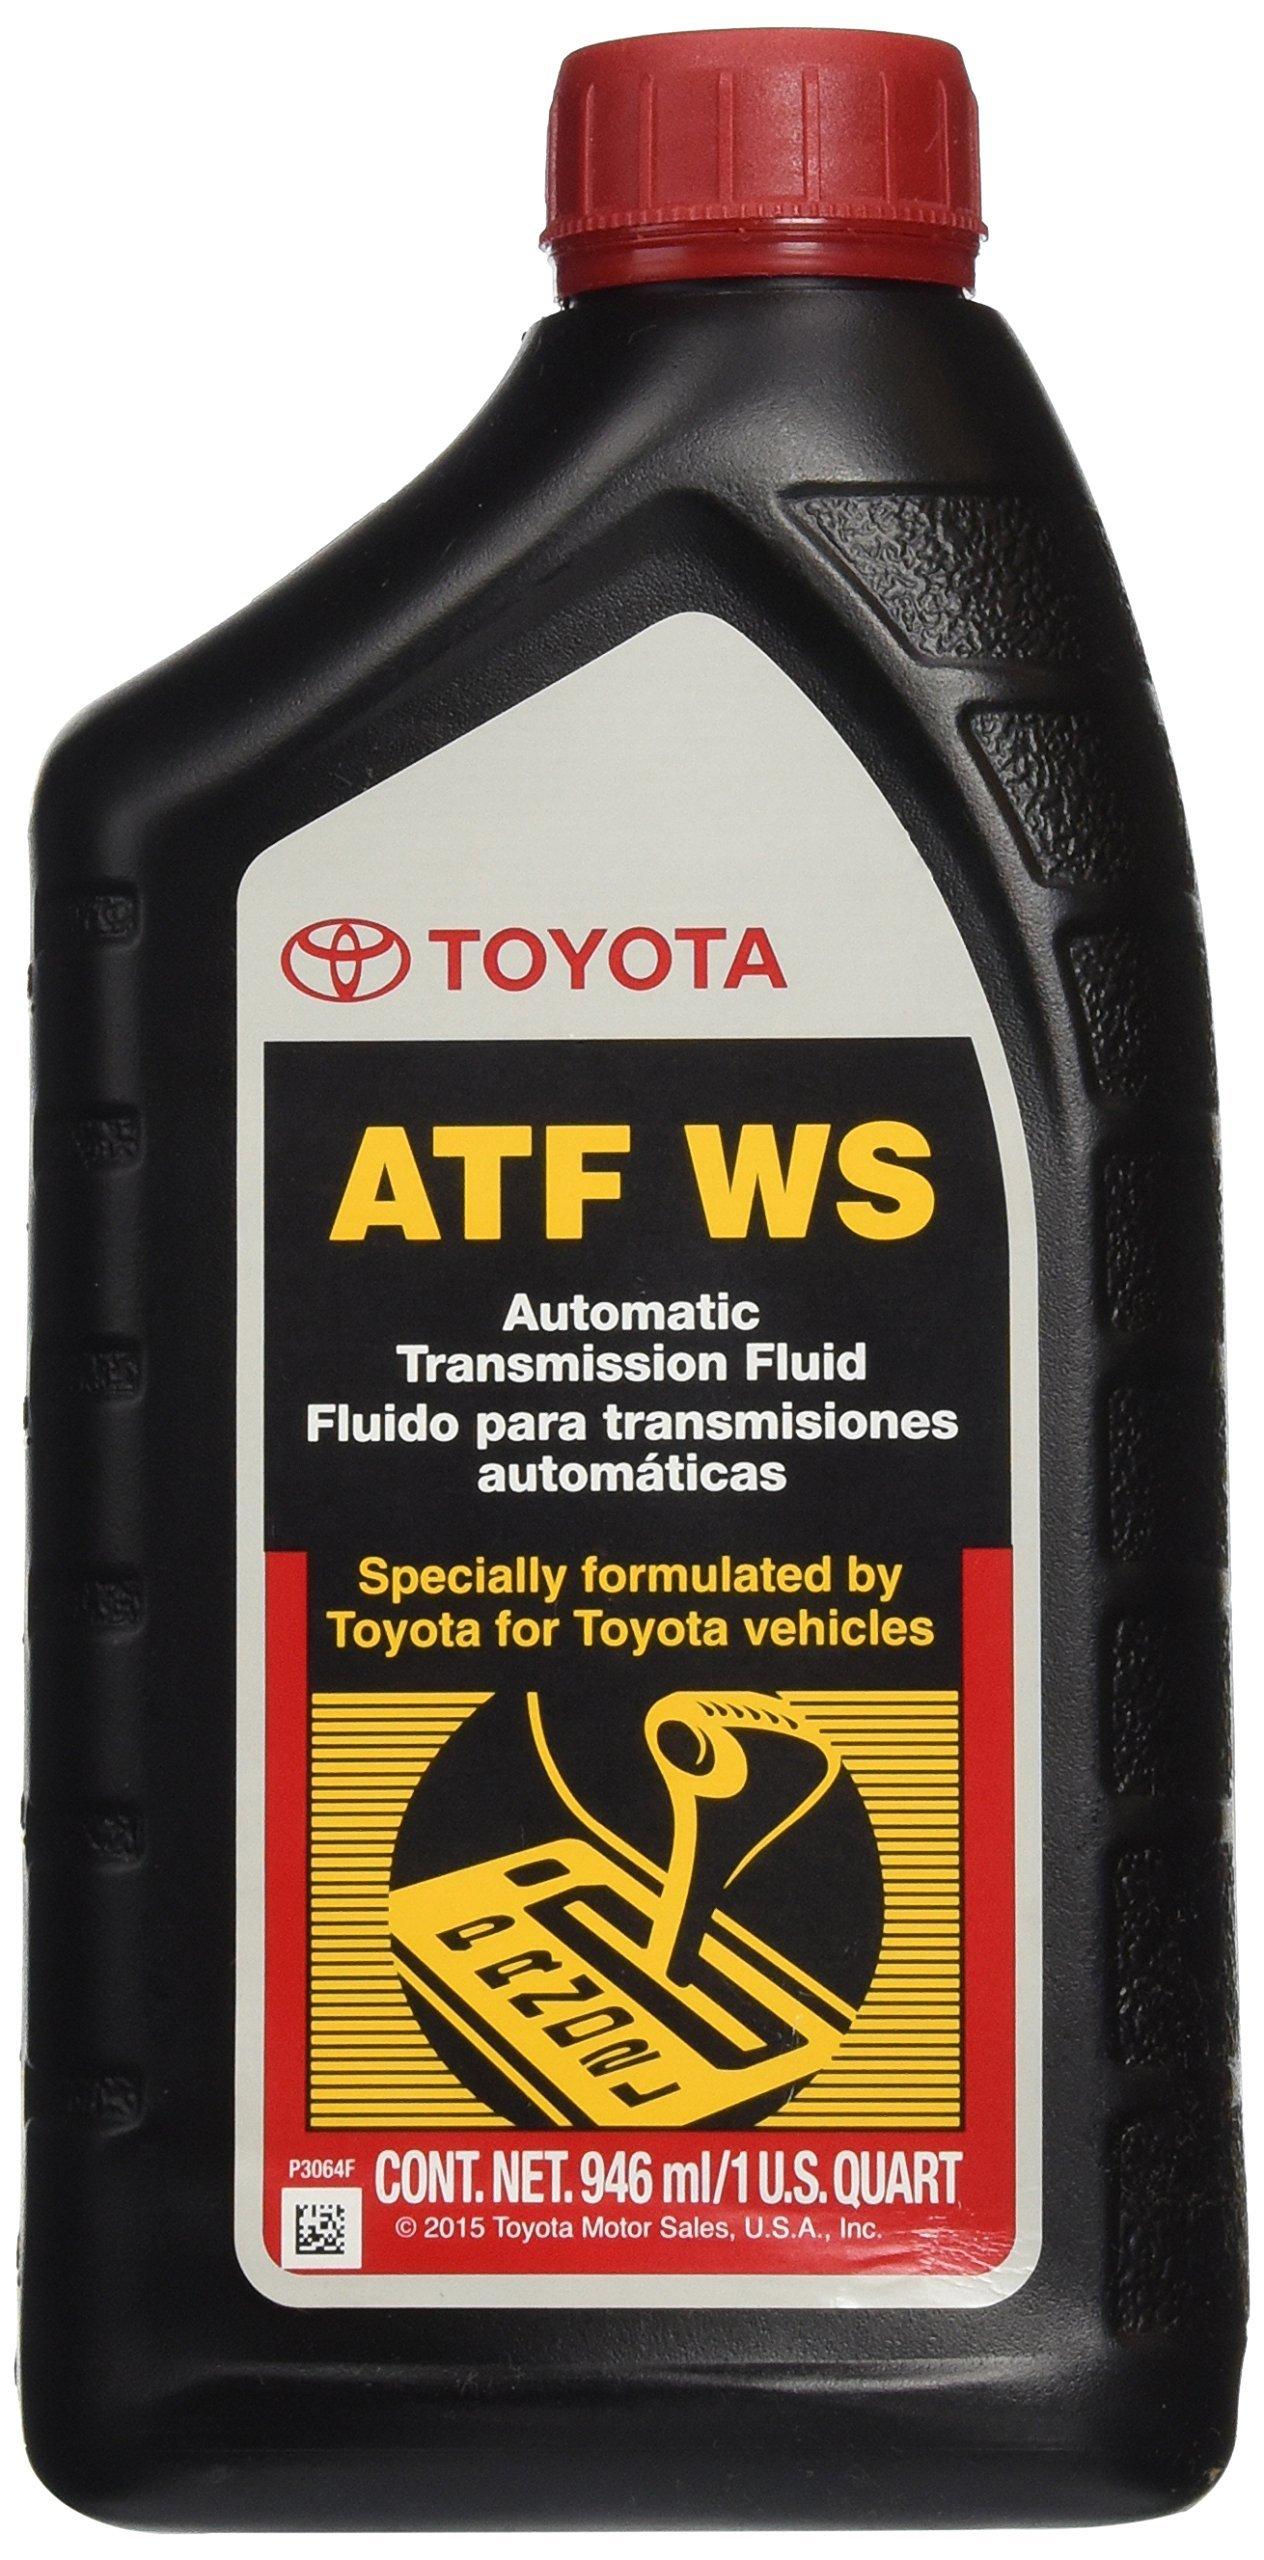 Genuine Toyota Lexus Automatic Transmission Fluid 1QT WS ATF World Standard (4 Pack)